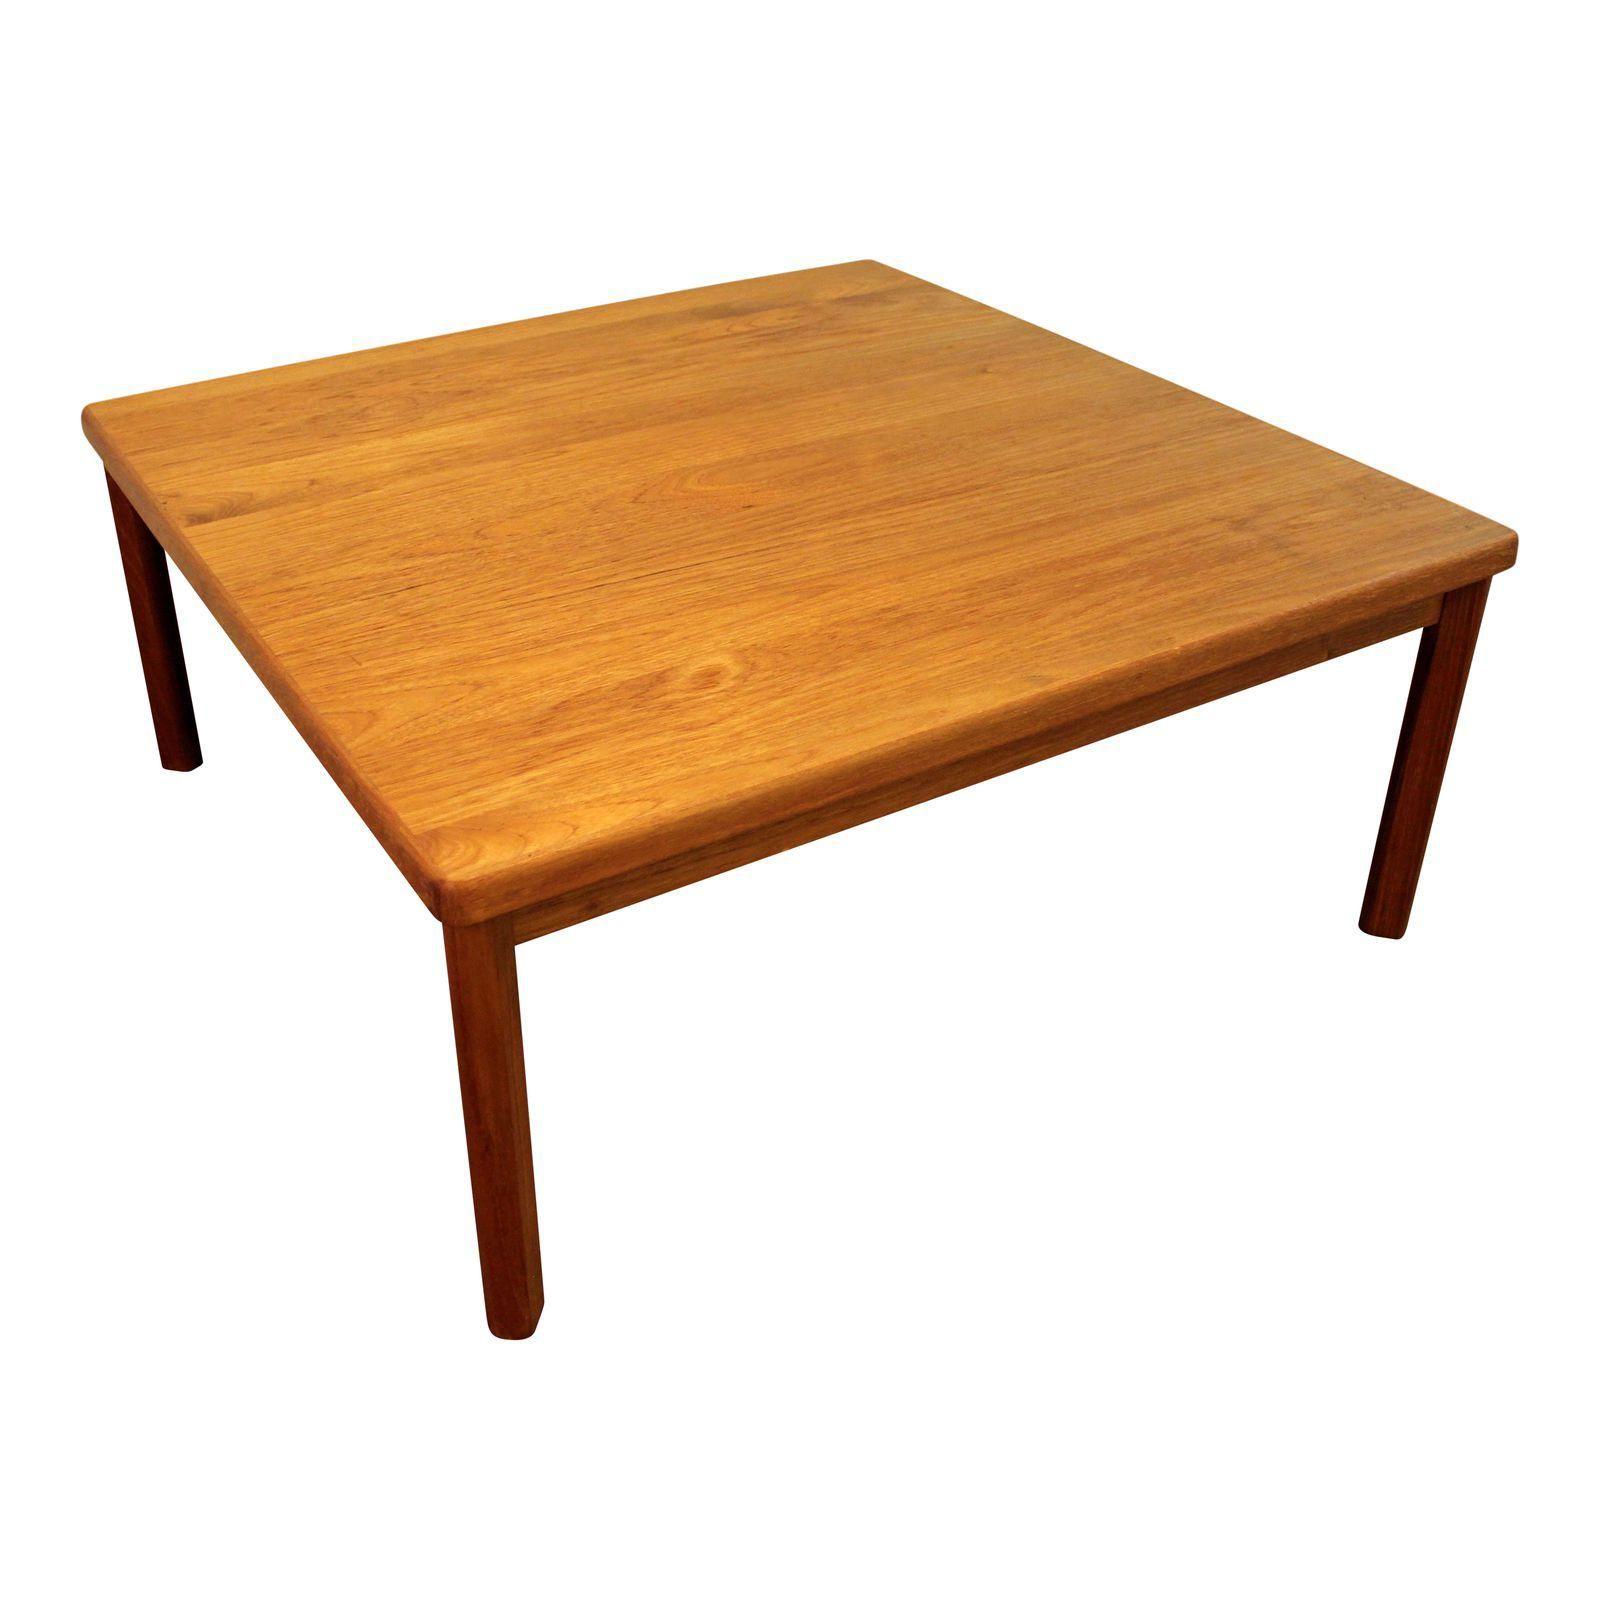 Mid Century Danish Modern Square Teak Coffee Table Image 1 Of 10 Coffee Table Teak Coffee Table Square Teak Coffee Table